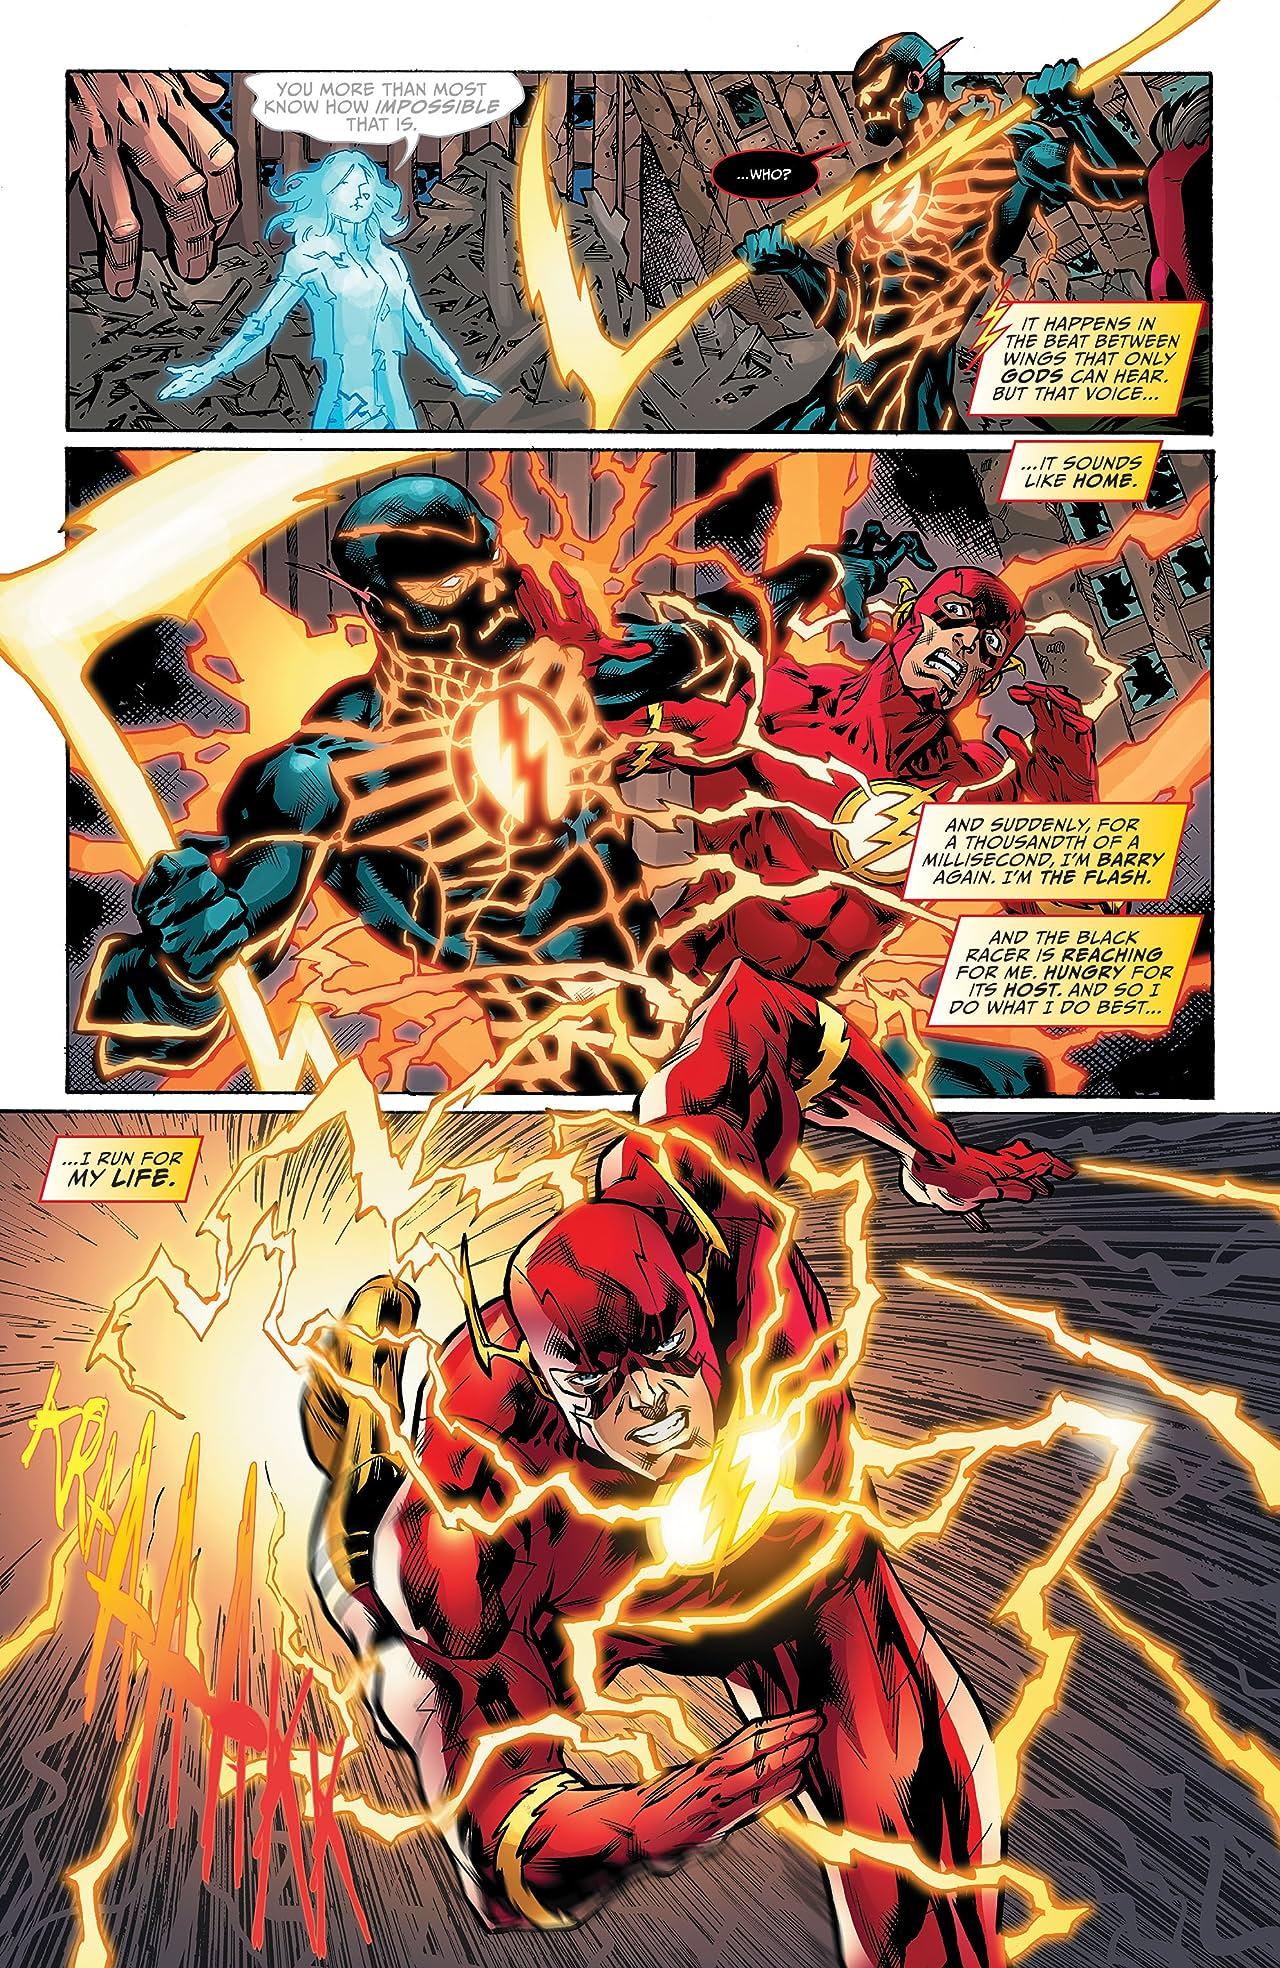 ... Justice League: The Darkseid War: The Flash (2015) #1